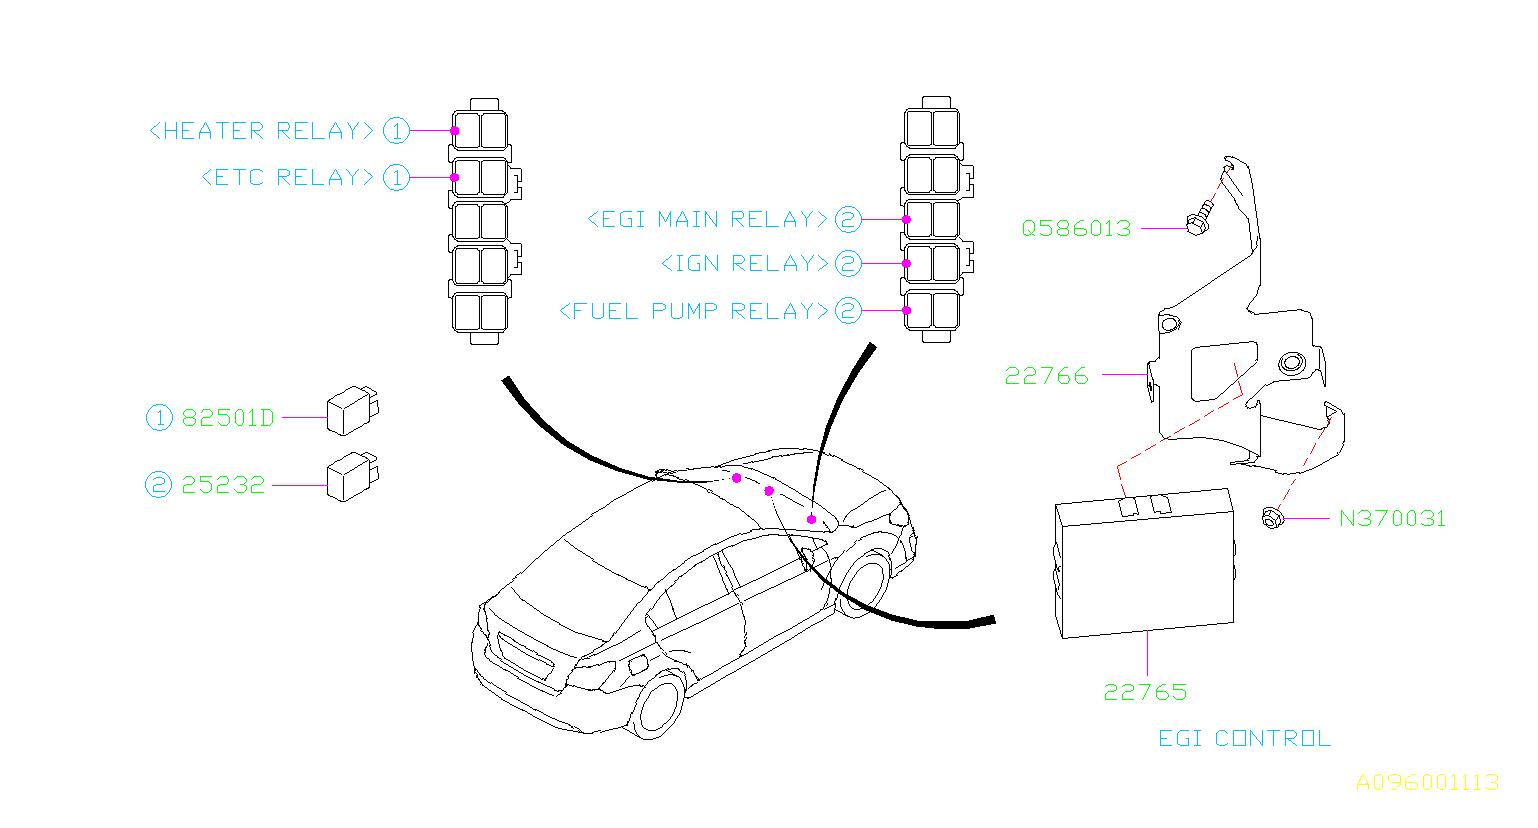 Subaru Impreza Unit-egi control. Engine, sensor, relay